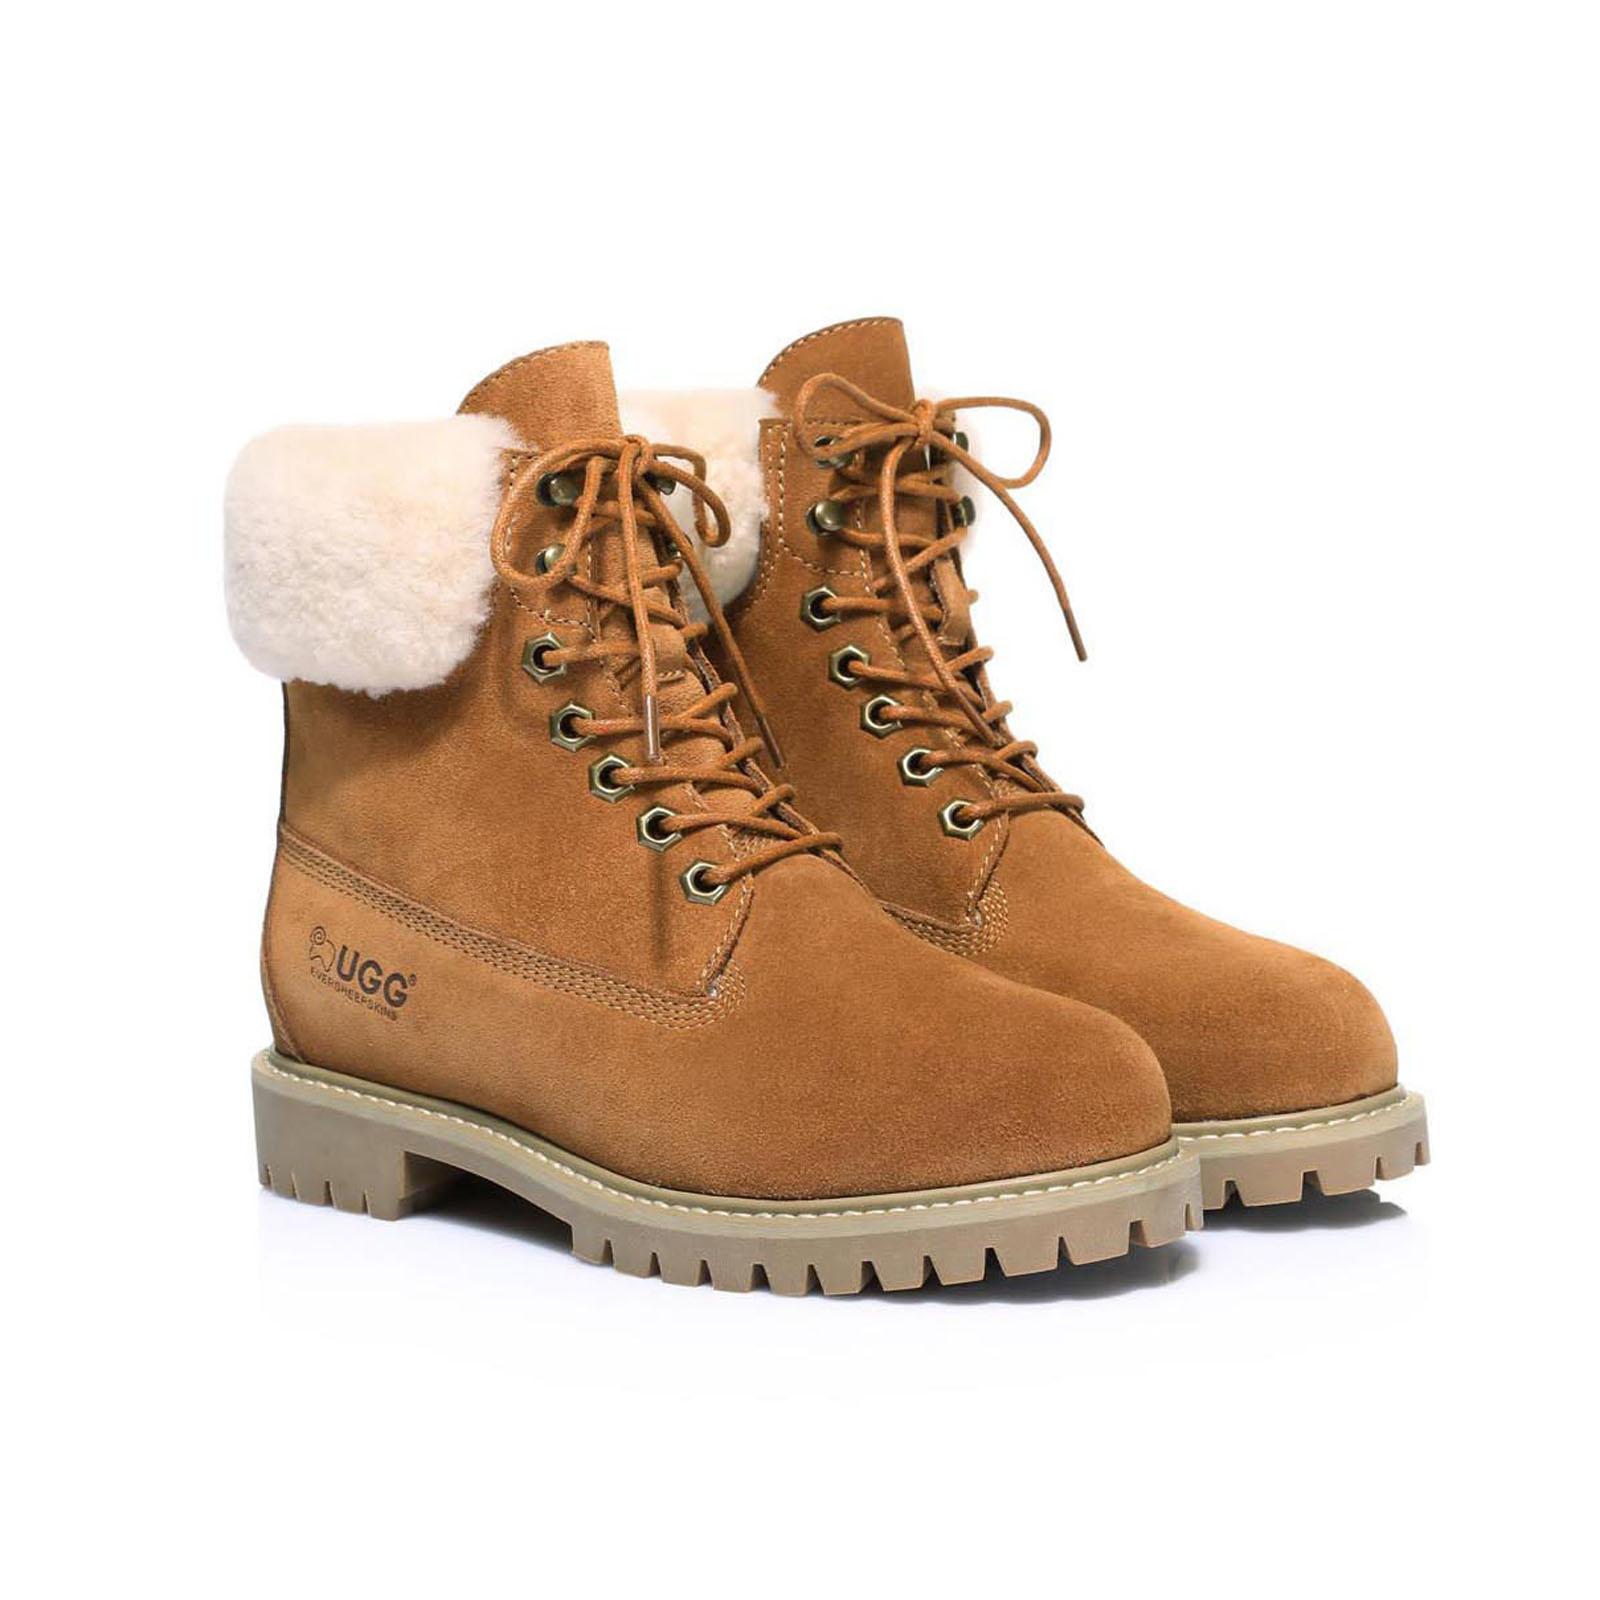 sheepskin ugg boots australia